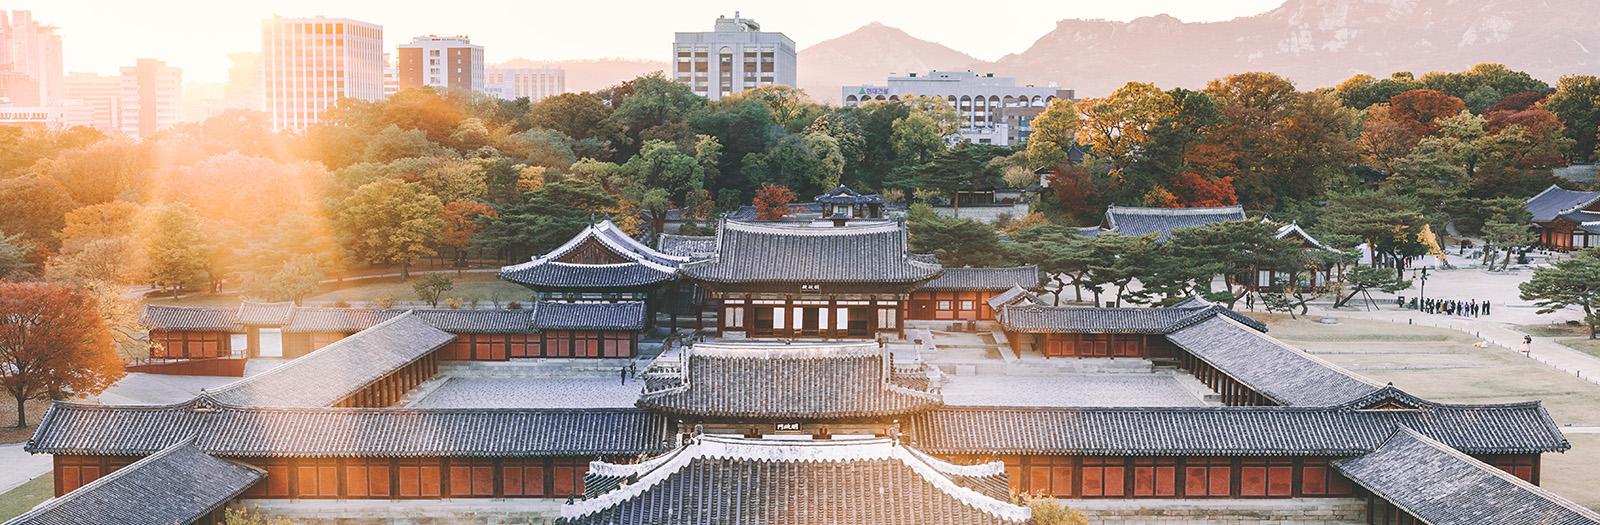 Building in South Korea